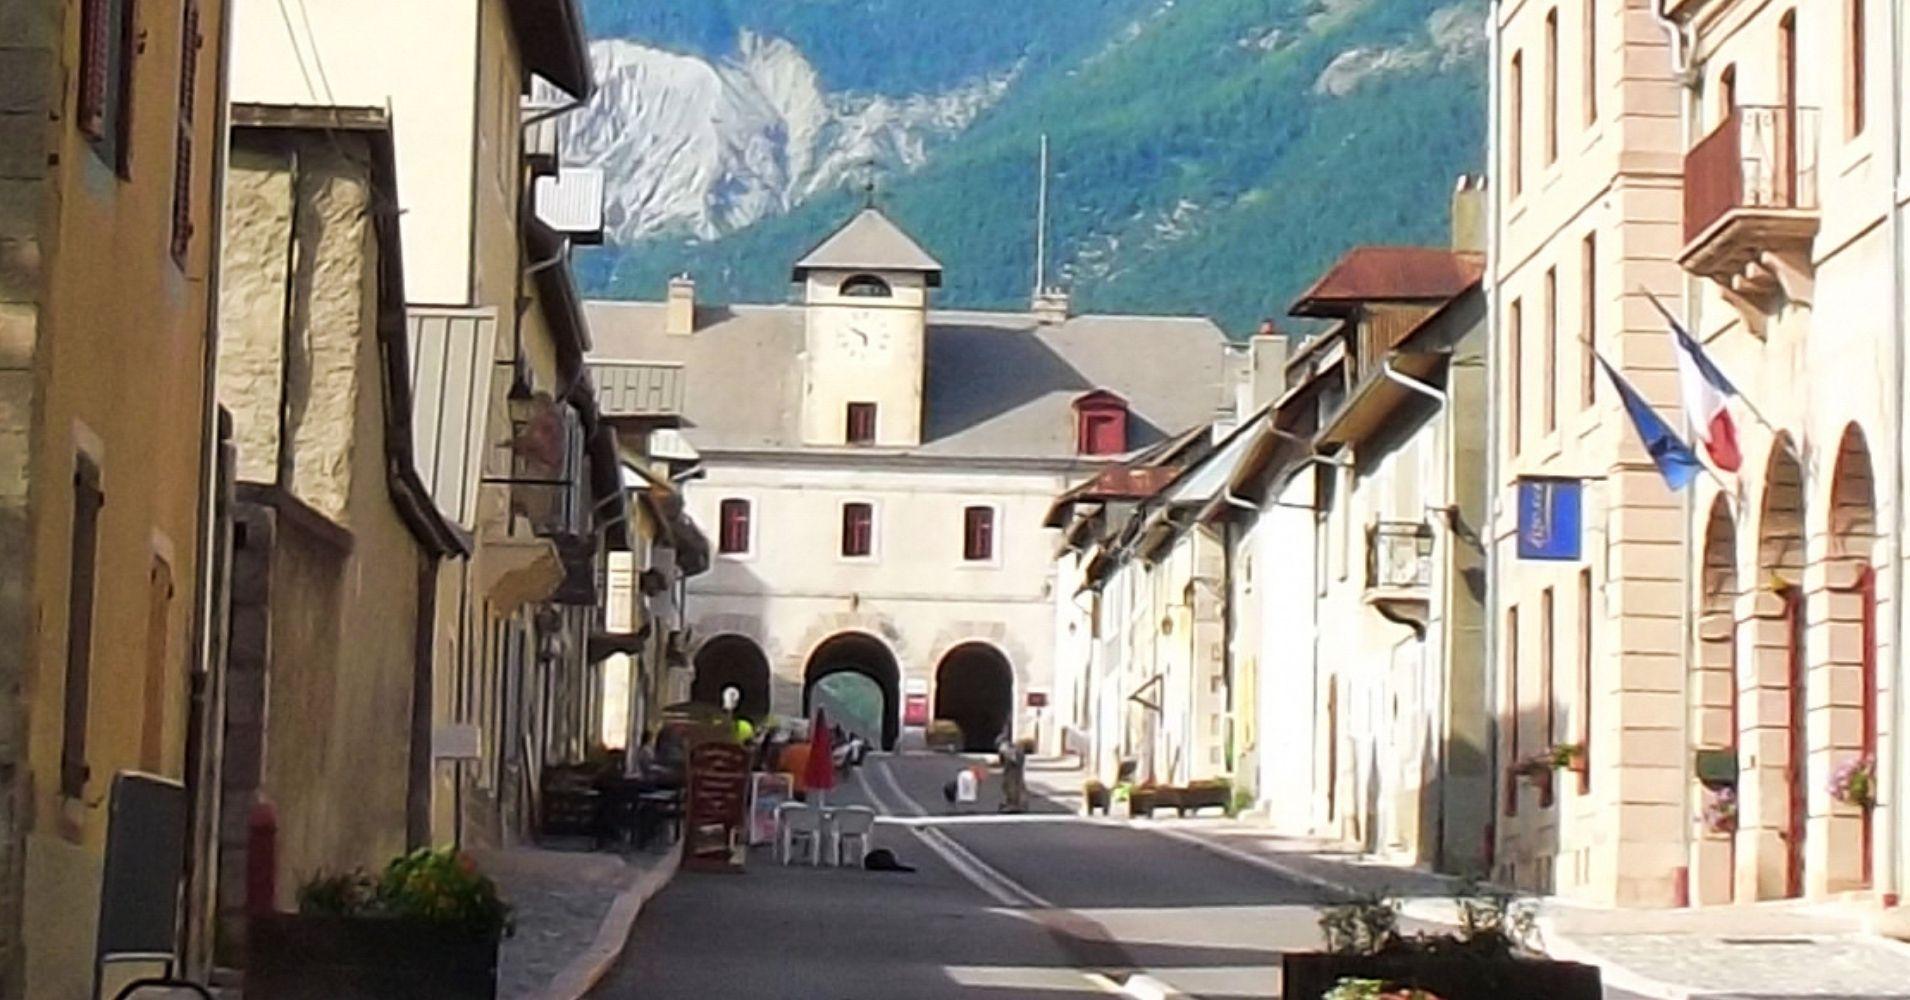 Mont Dauphin Fuerte de Vauban. Departamento de Altos Alpes. Provenza-Alpes-Costa Azul, Francia.